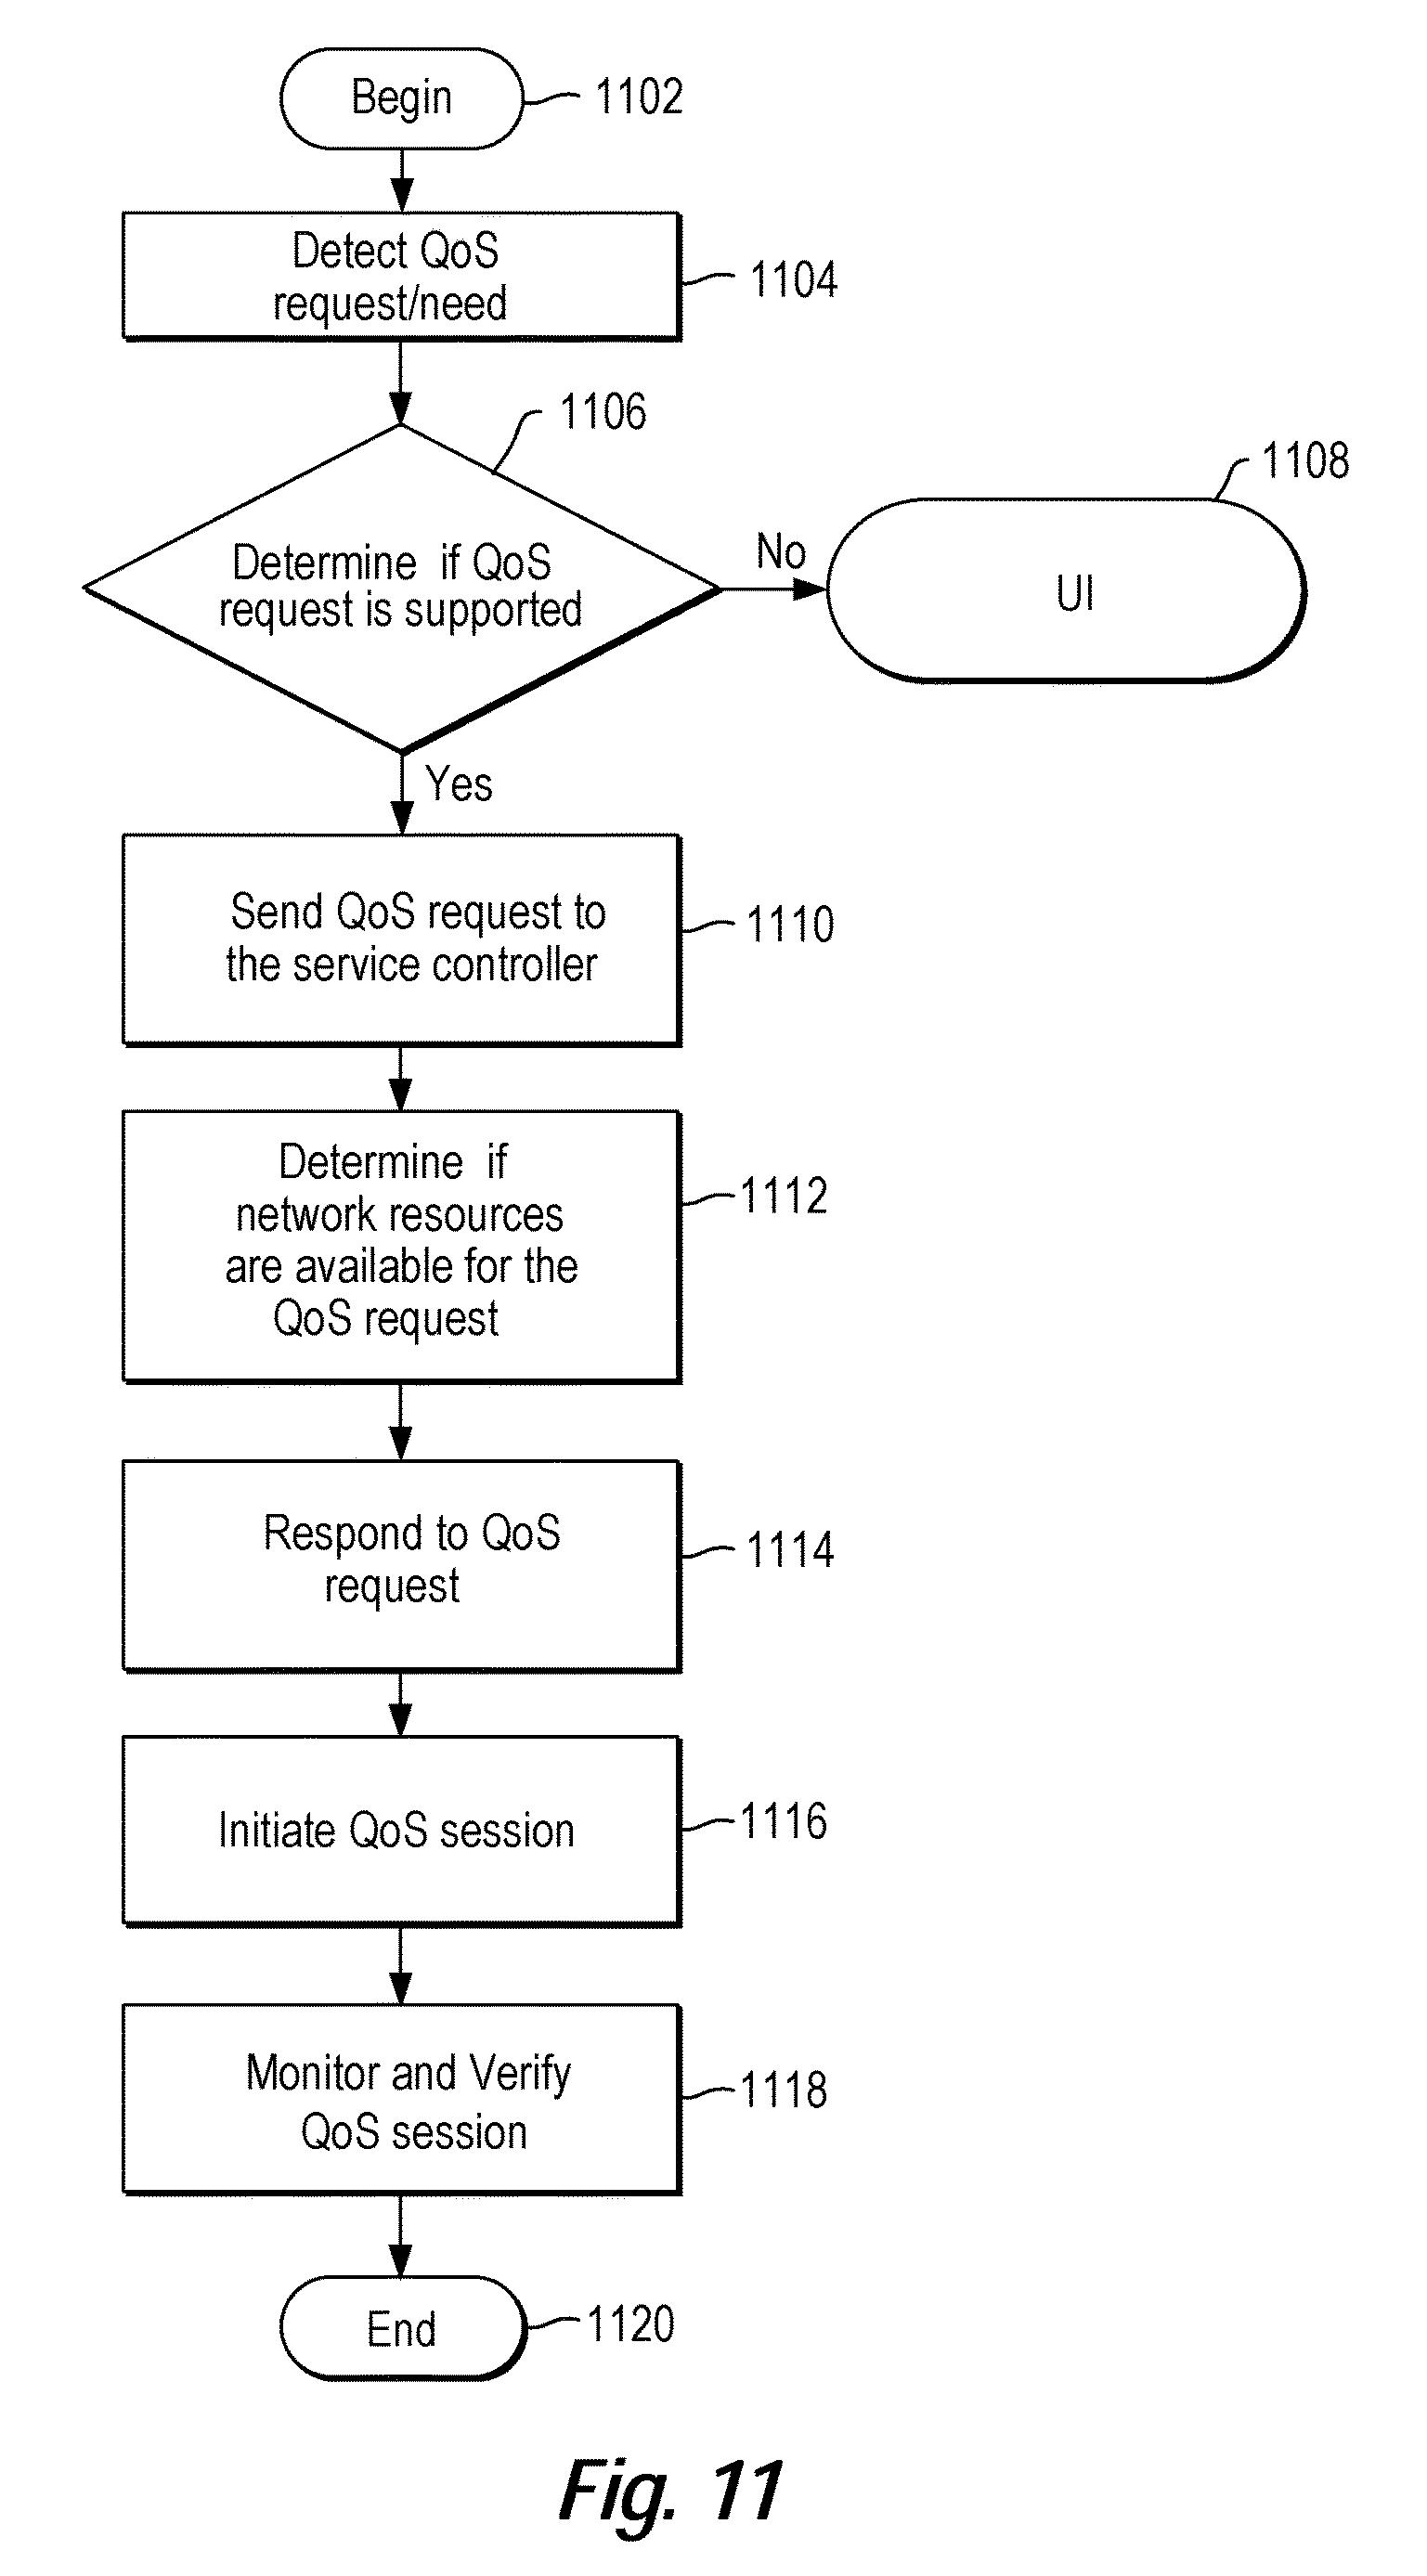 Patent US 9,942,796 B2